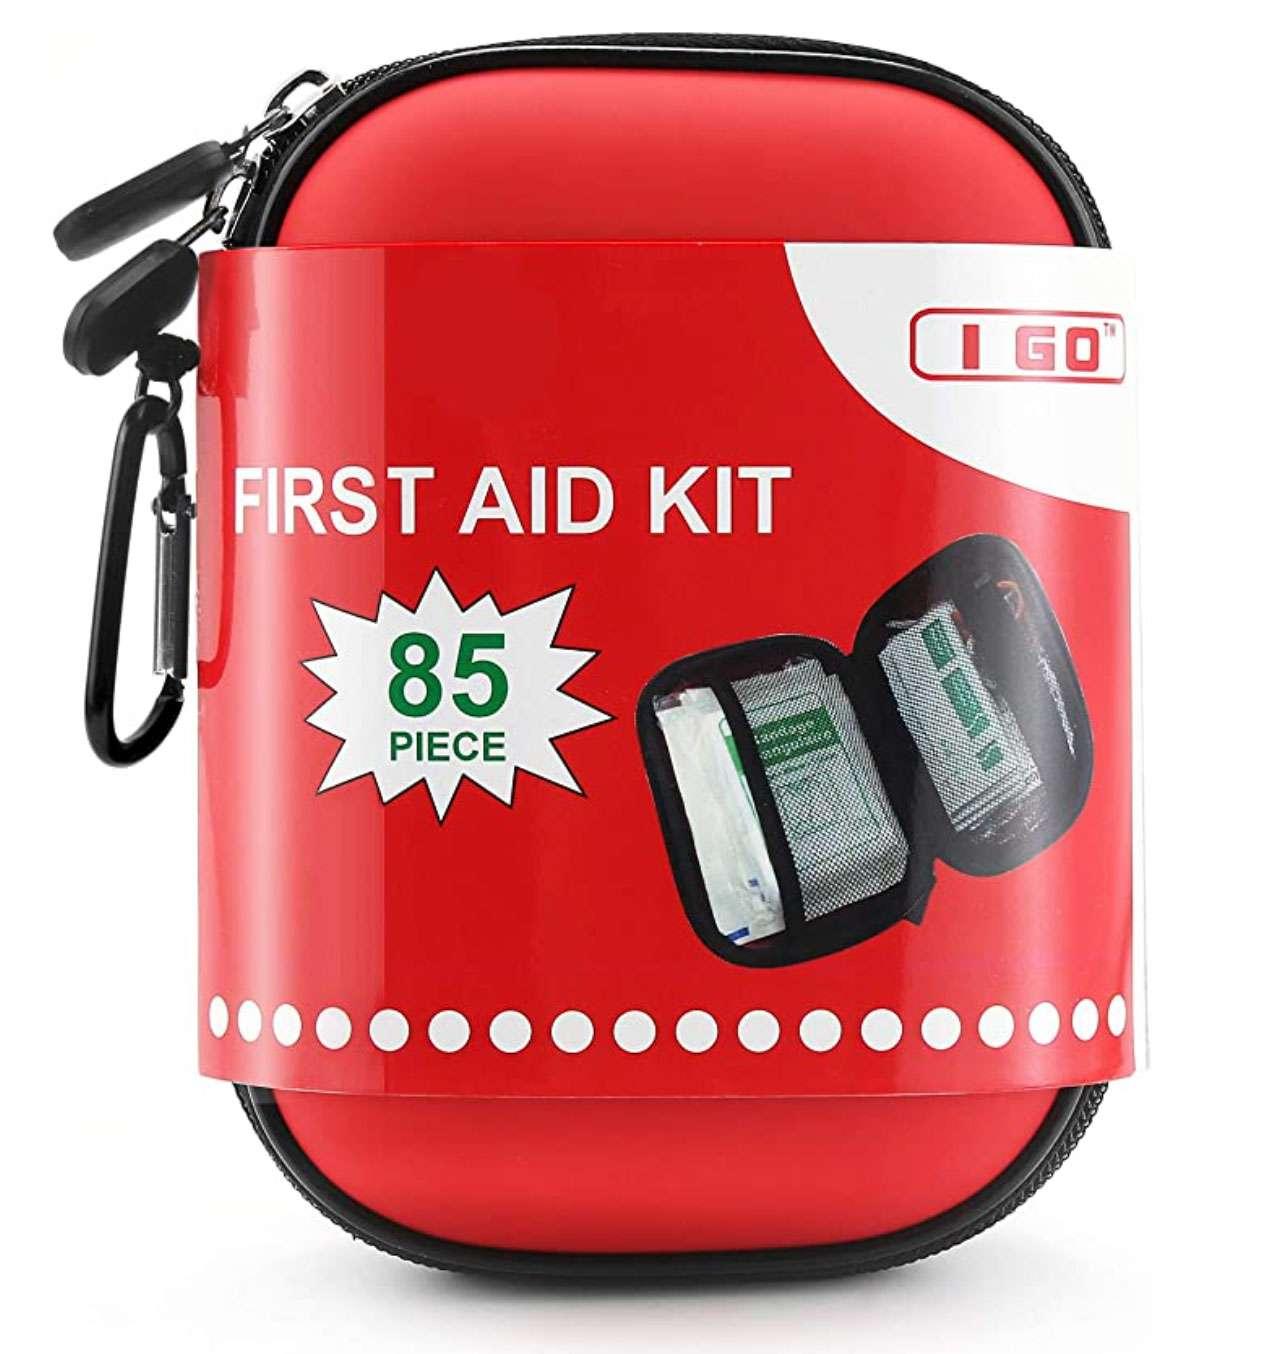 I GO mini first aid kit